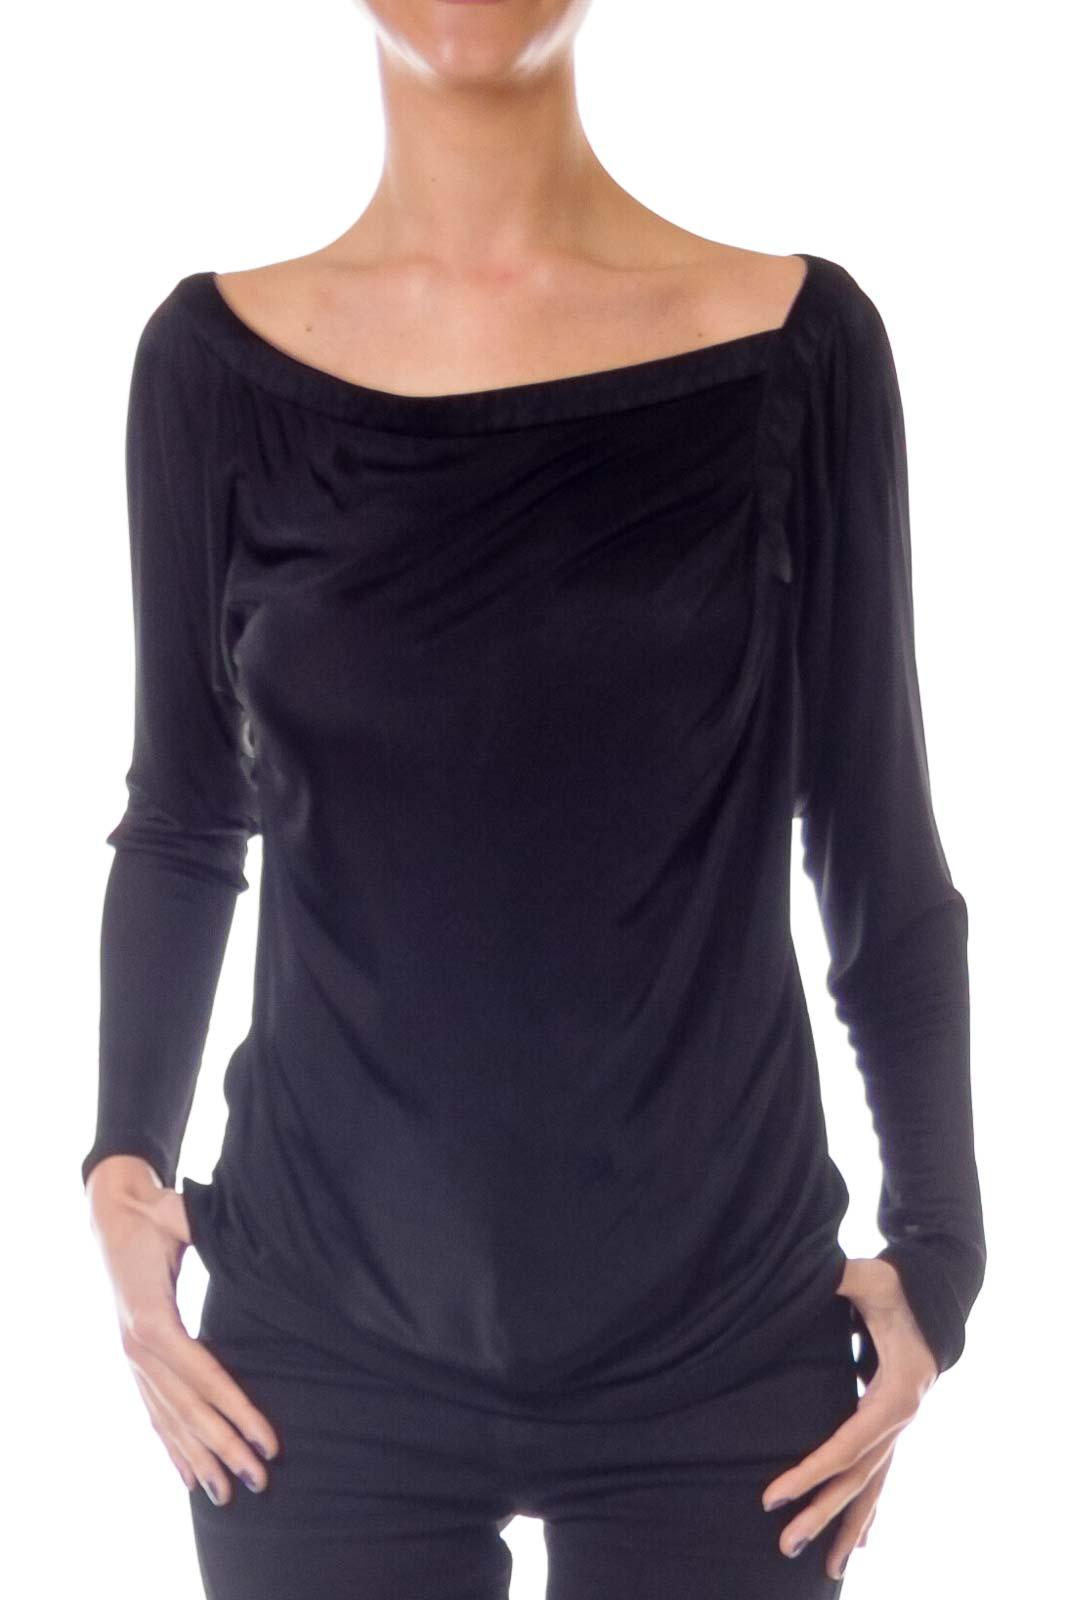 Black Asymmetric Top Front